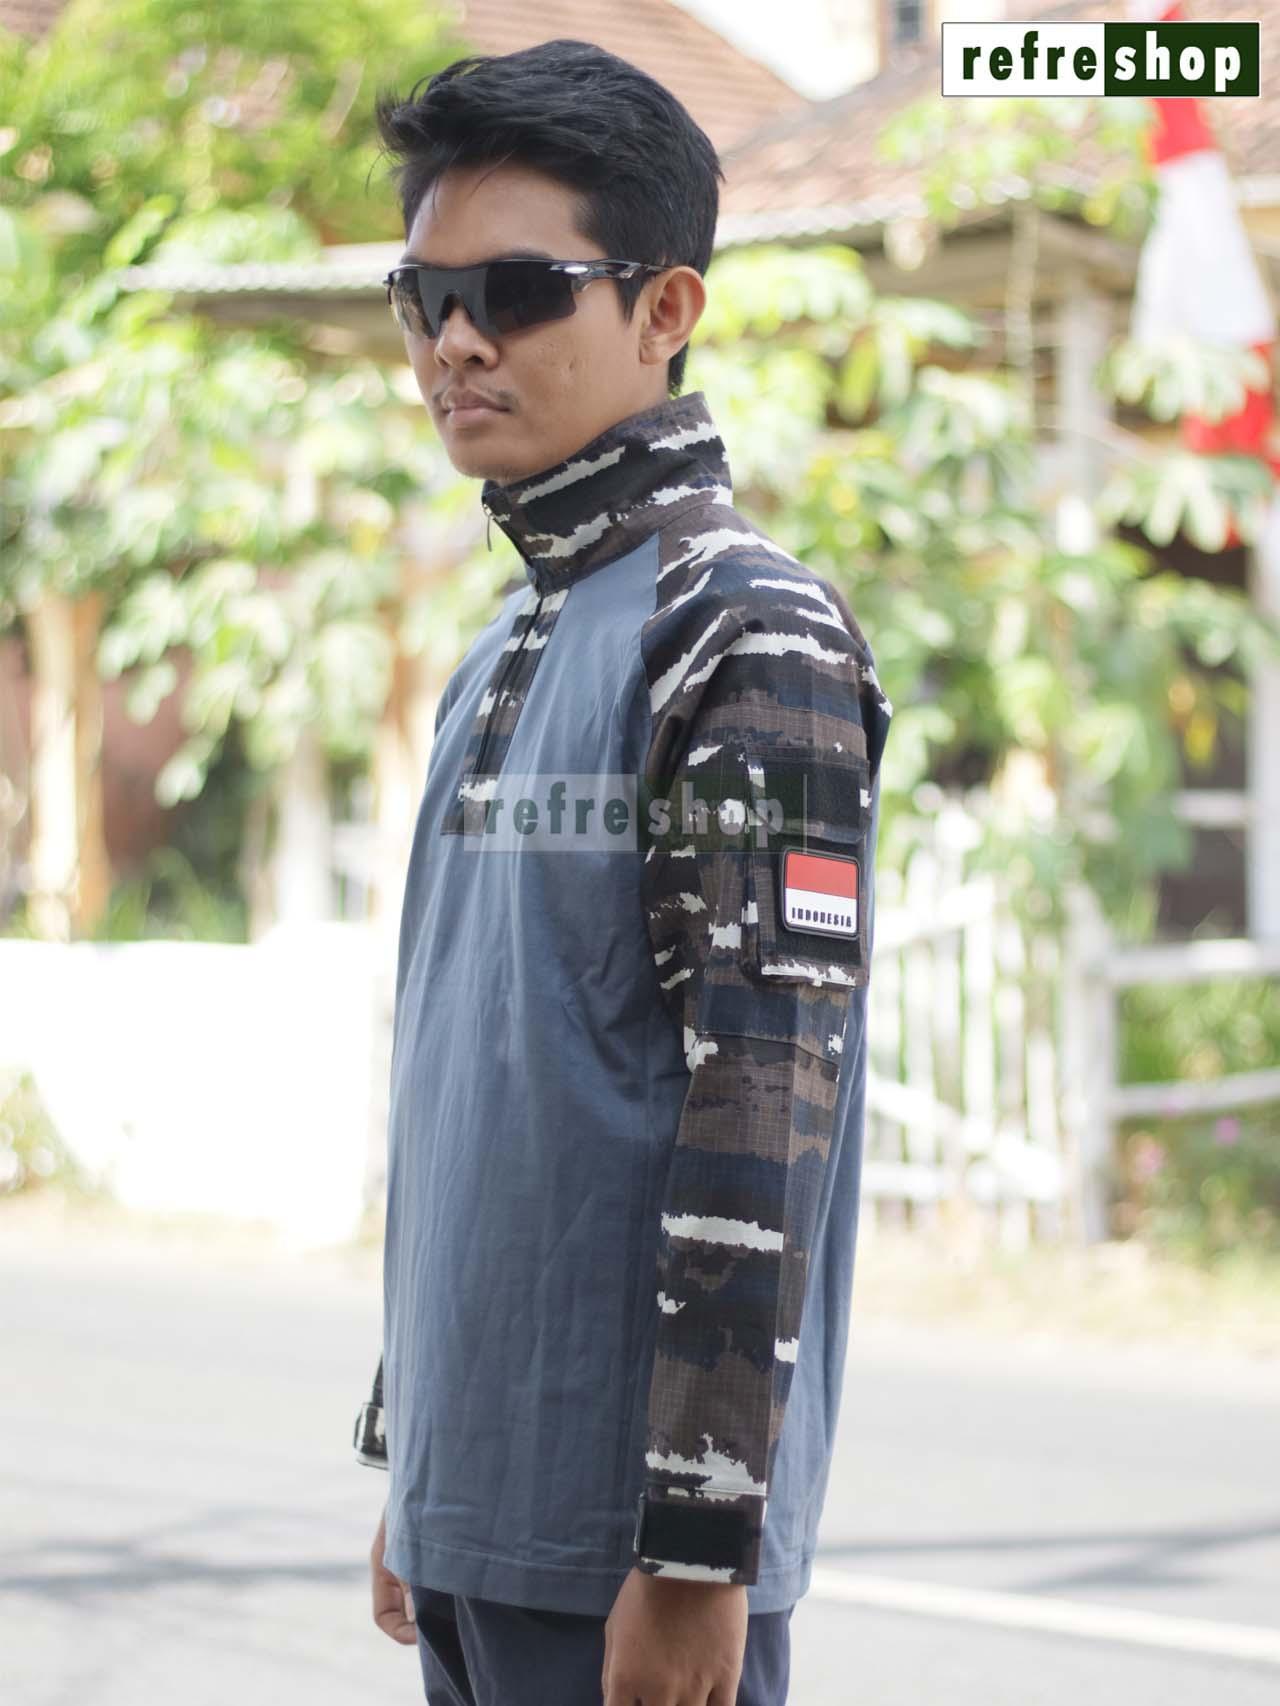 ... Kaos Tactical Militer Nyaman Berkualitas Cotton Ripstop Tebal Army KTCCRSDD - 4